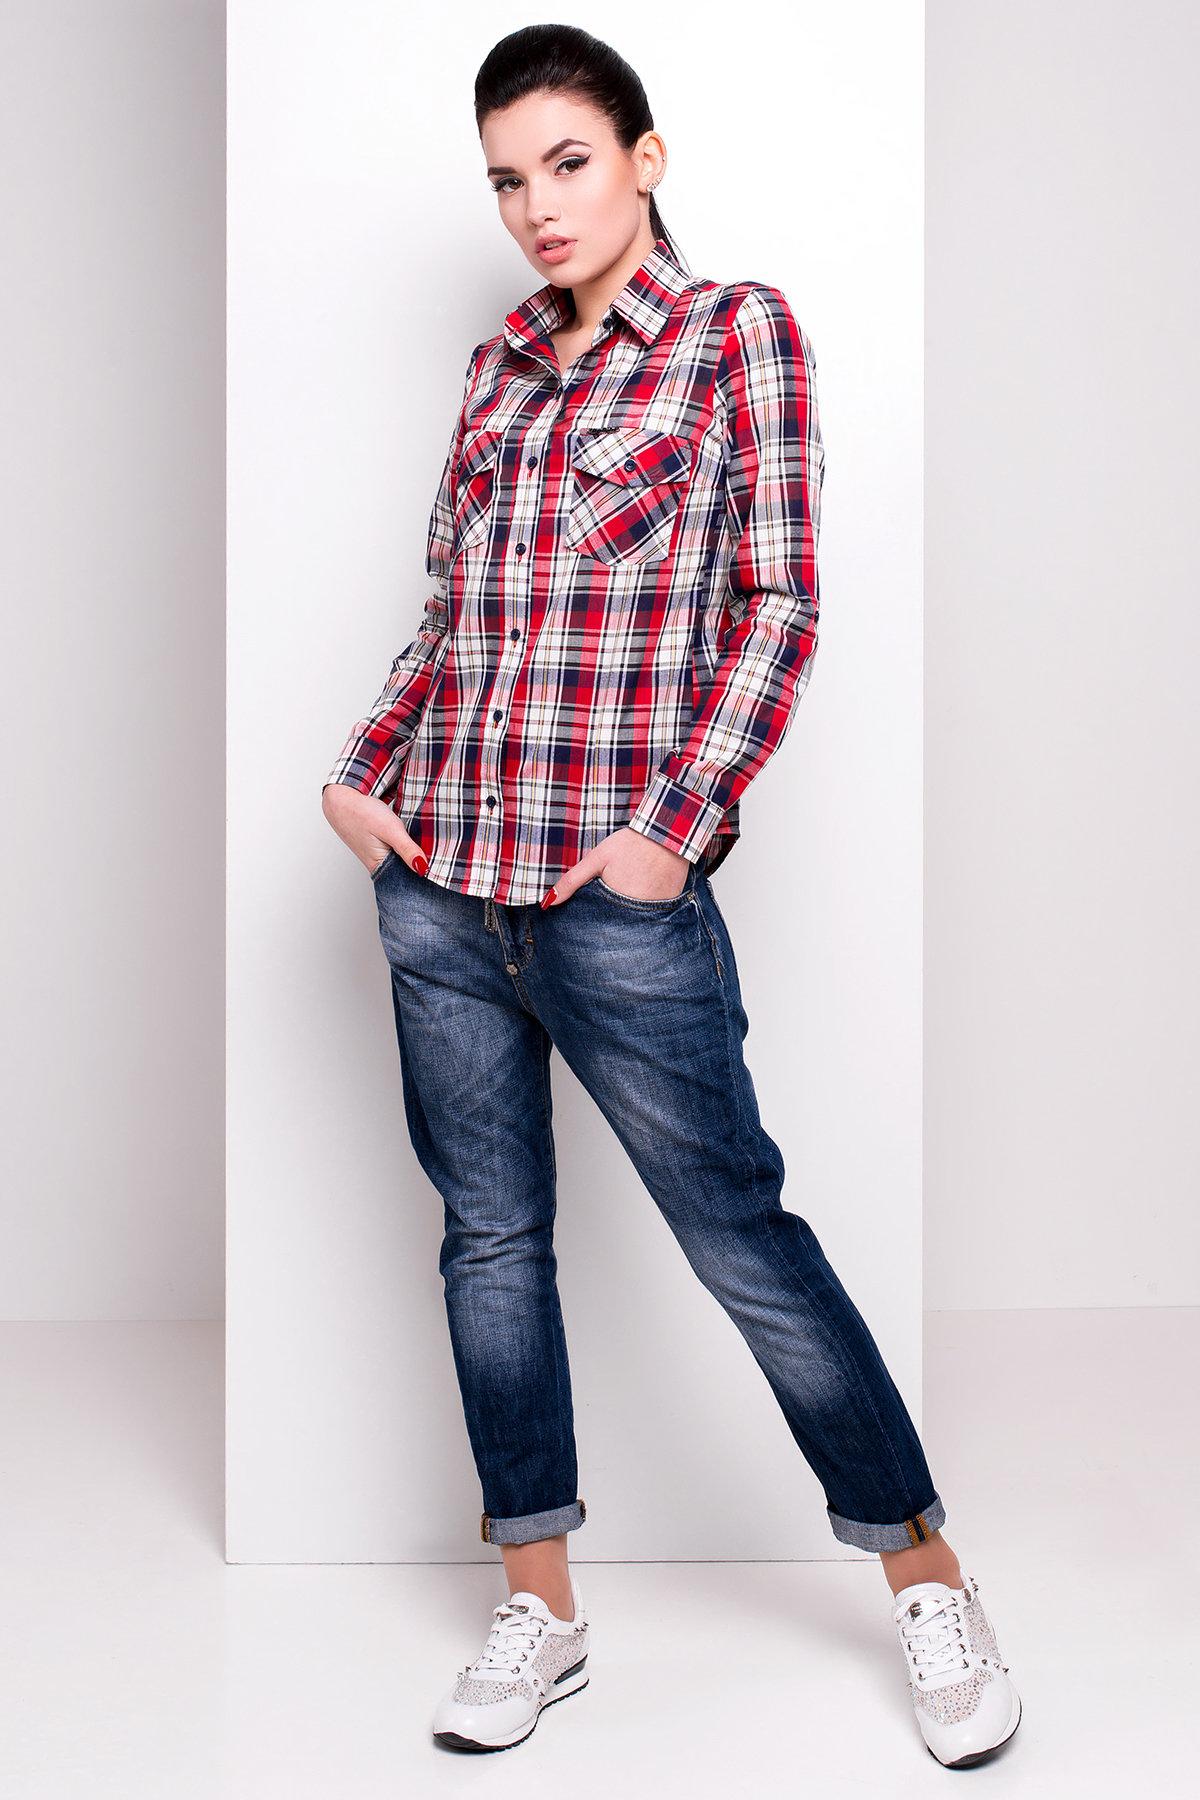 Блузки оптом от производителя Modus Рубашка Зара 3483